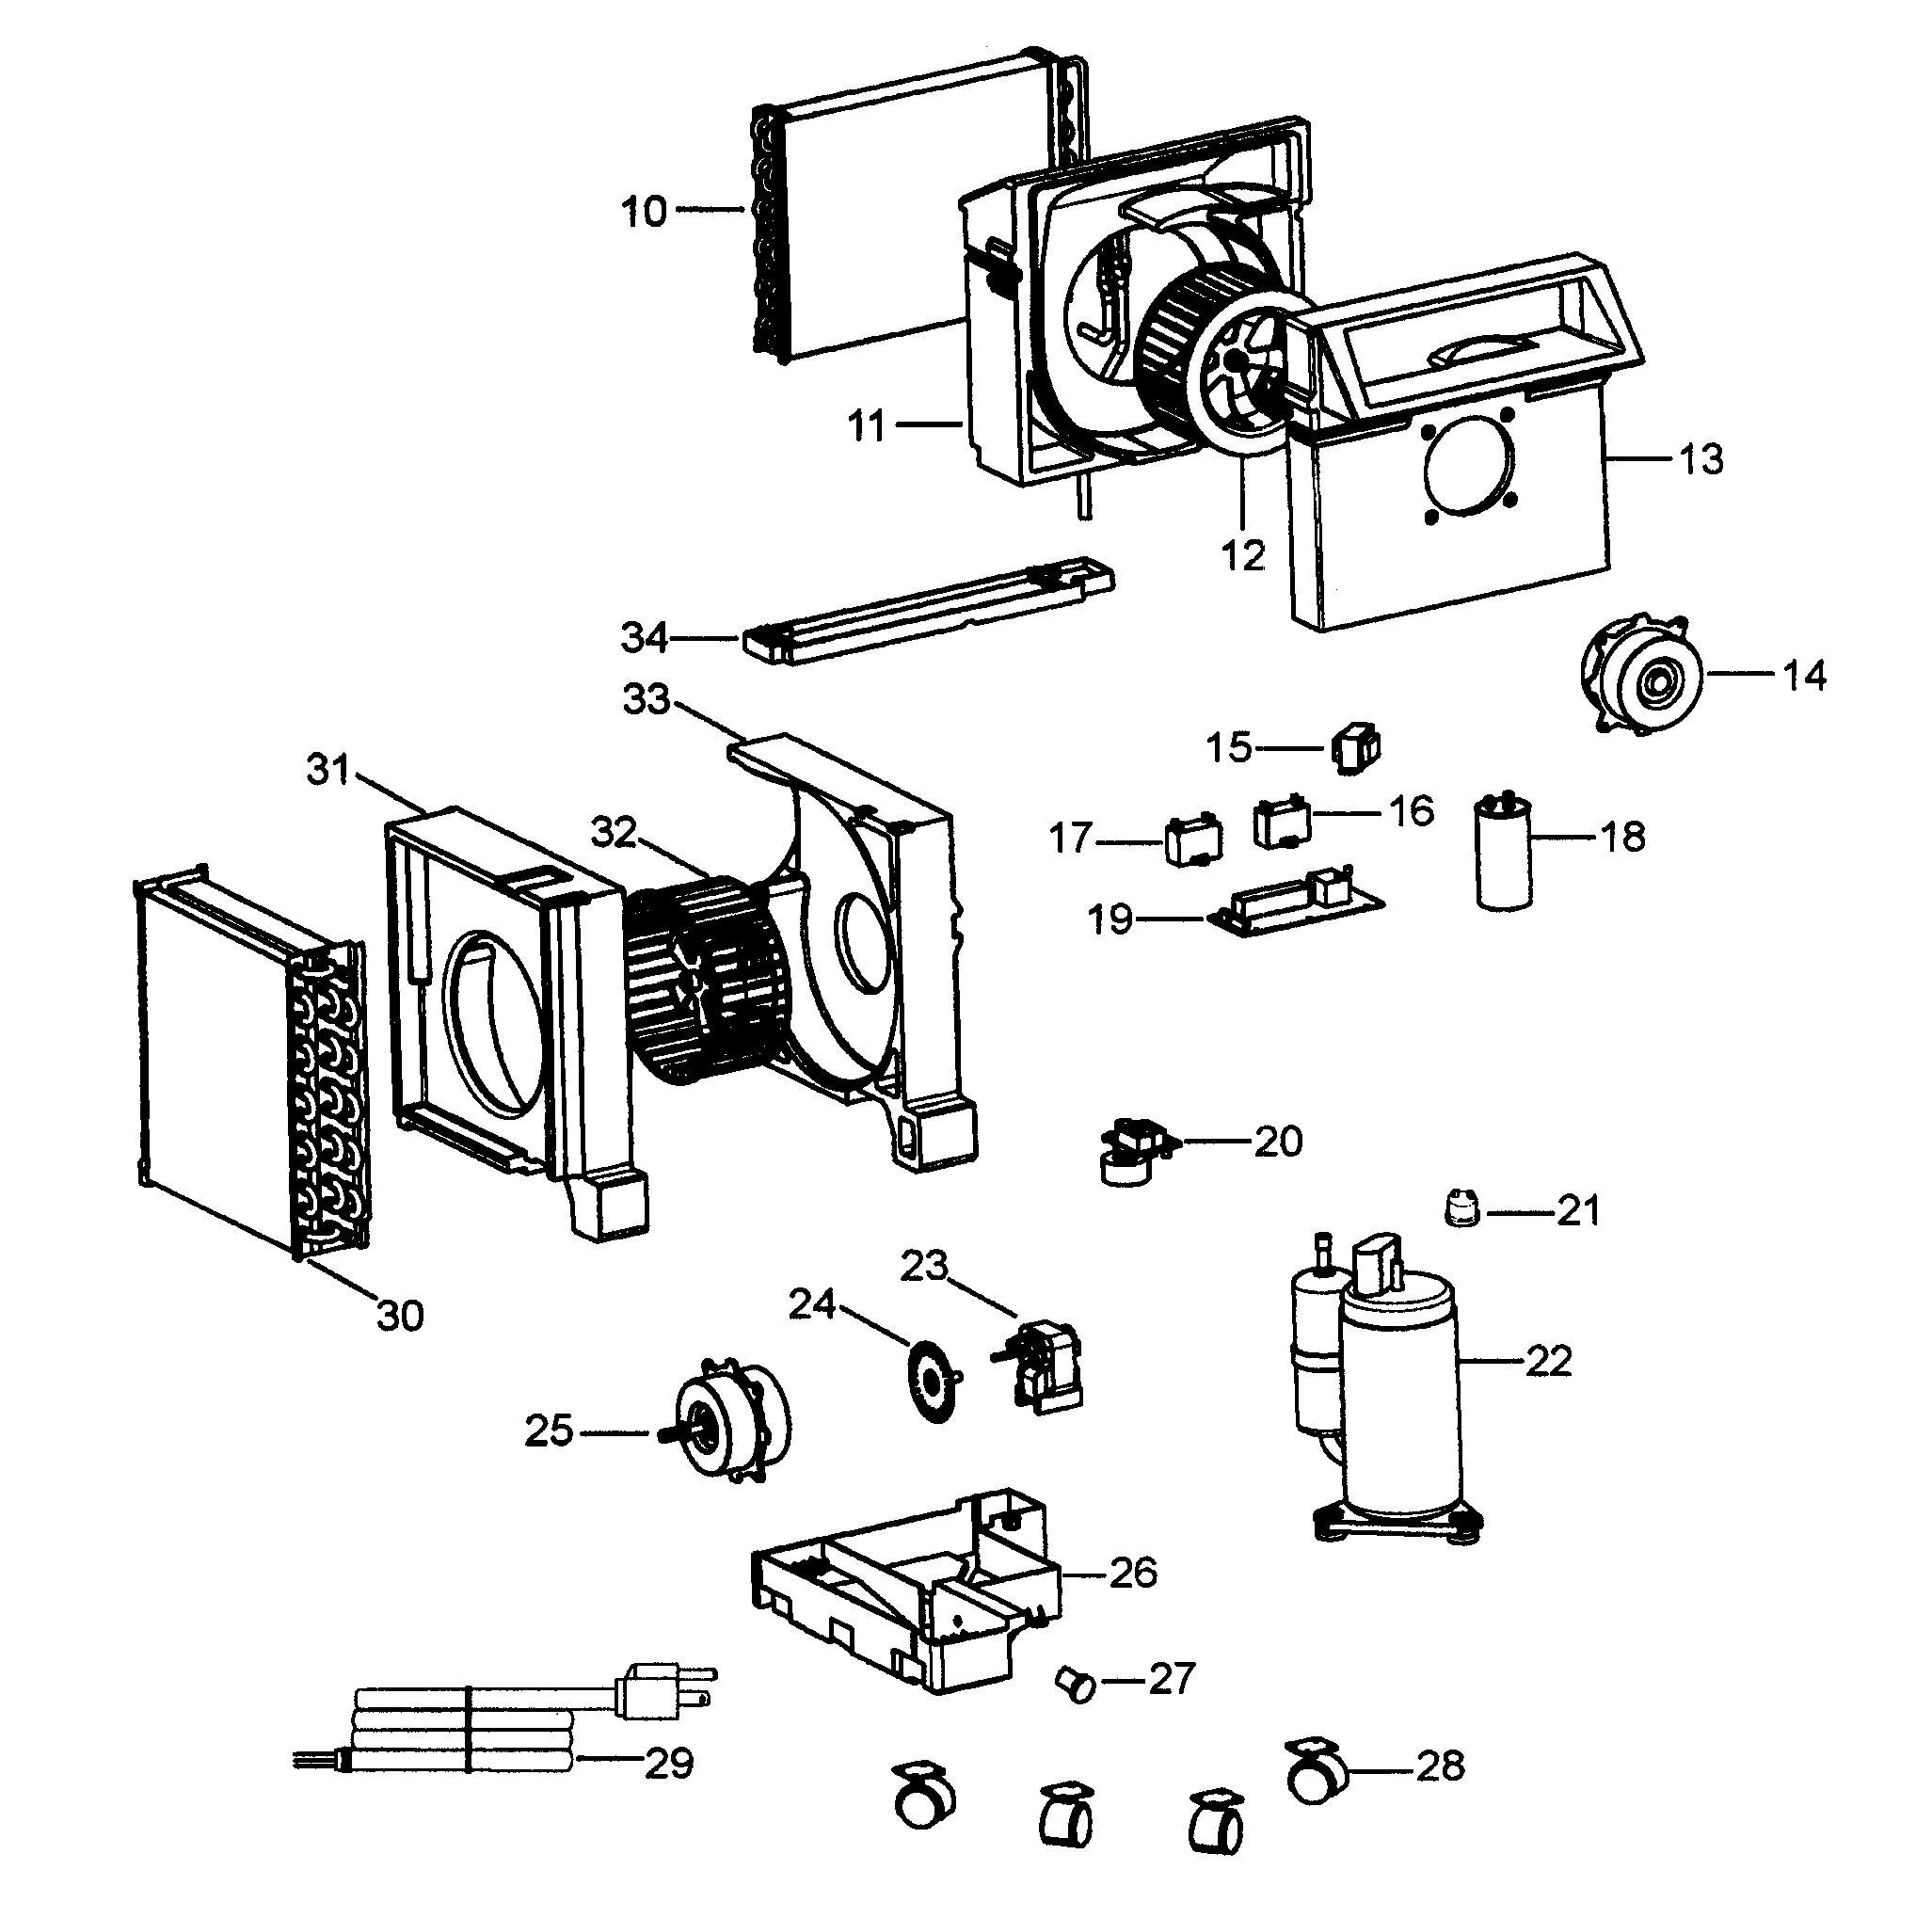 Delonghi portable air conditioner parts model pacc120 sears partsdirect